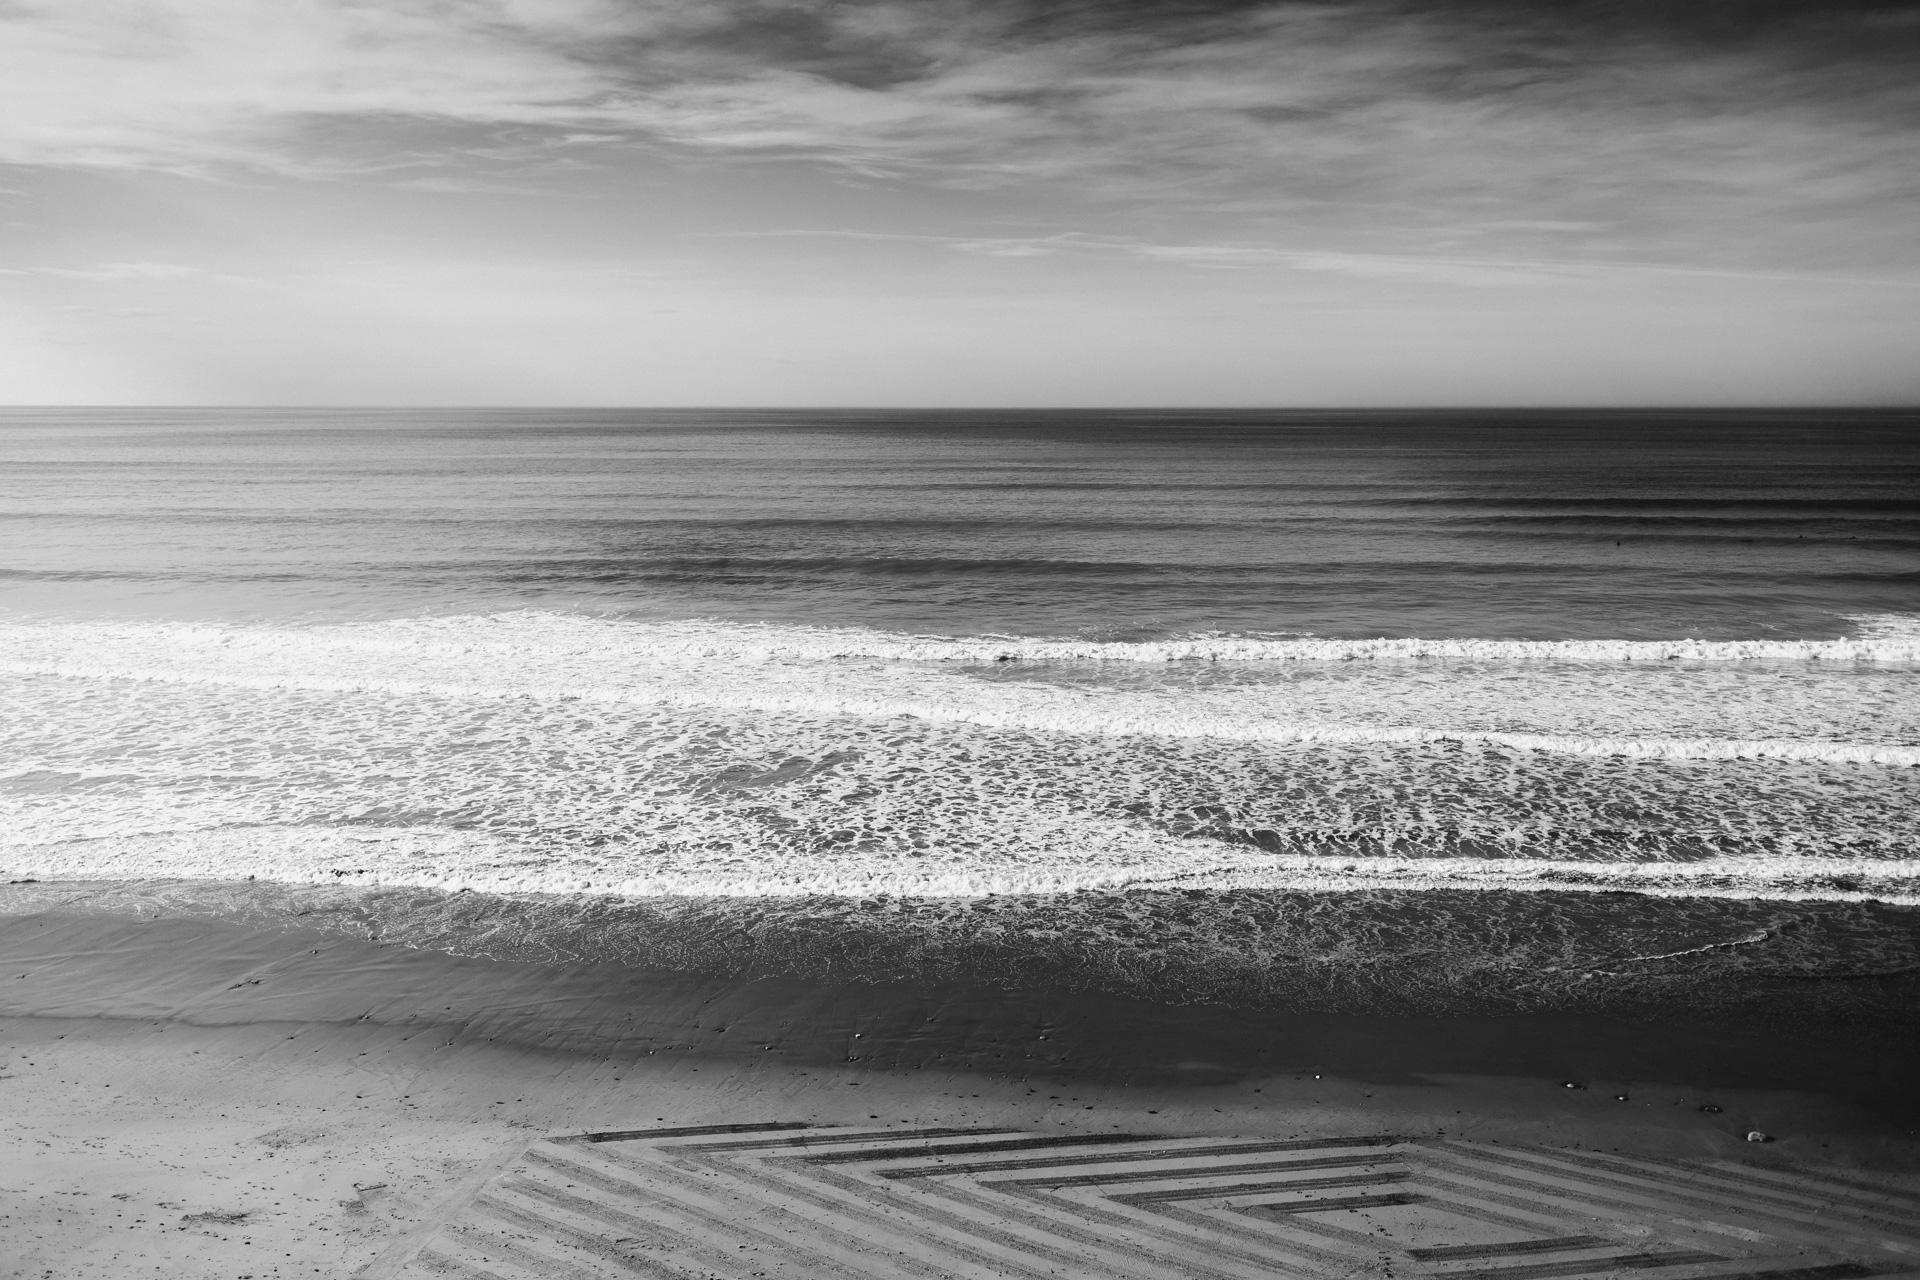 Damien-dohmen-sand-print-lx-one-30